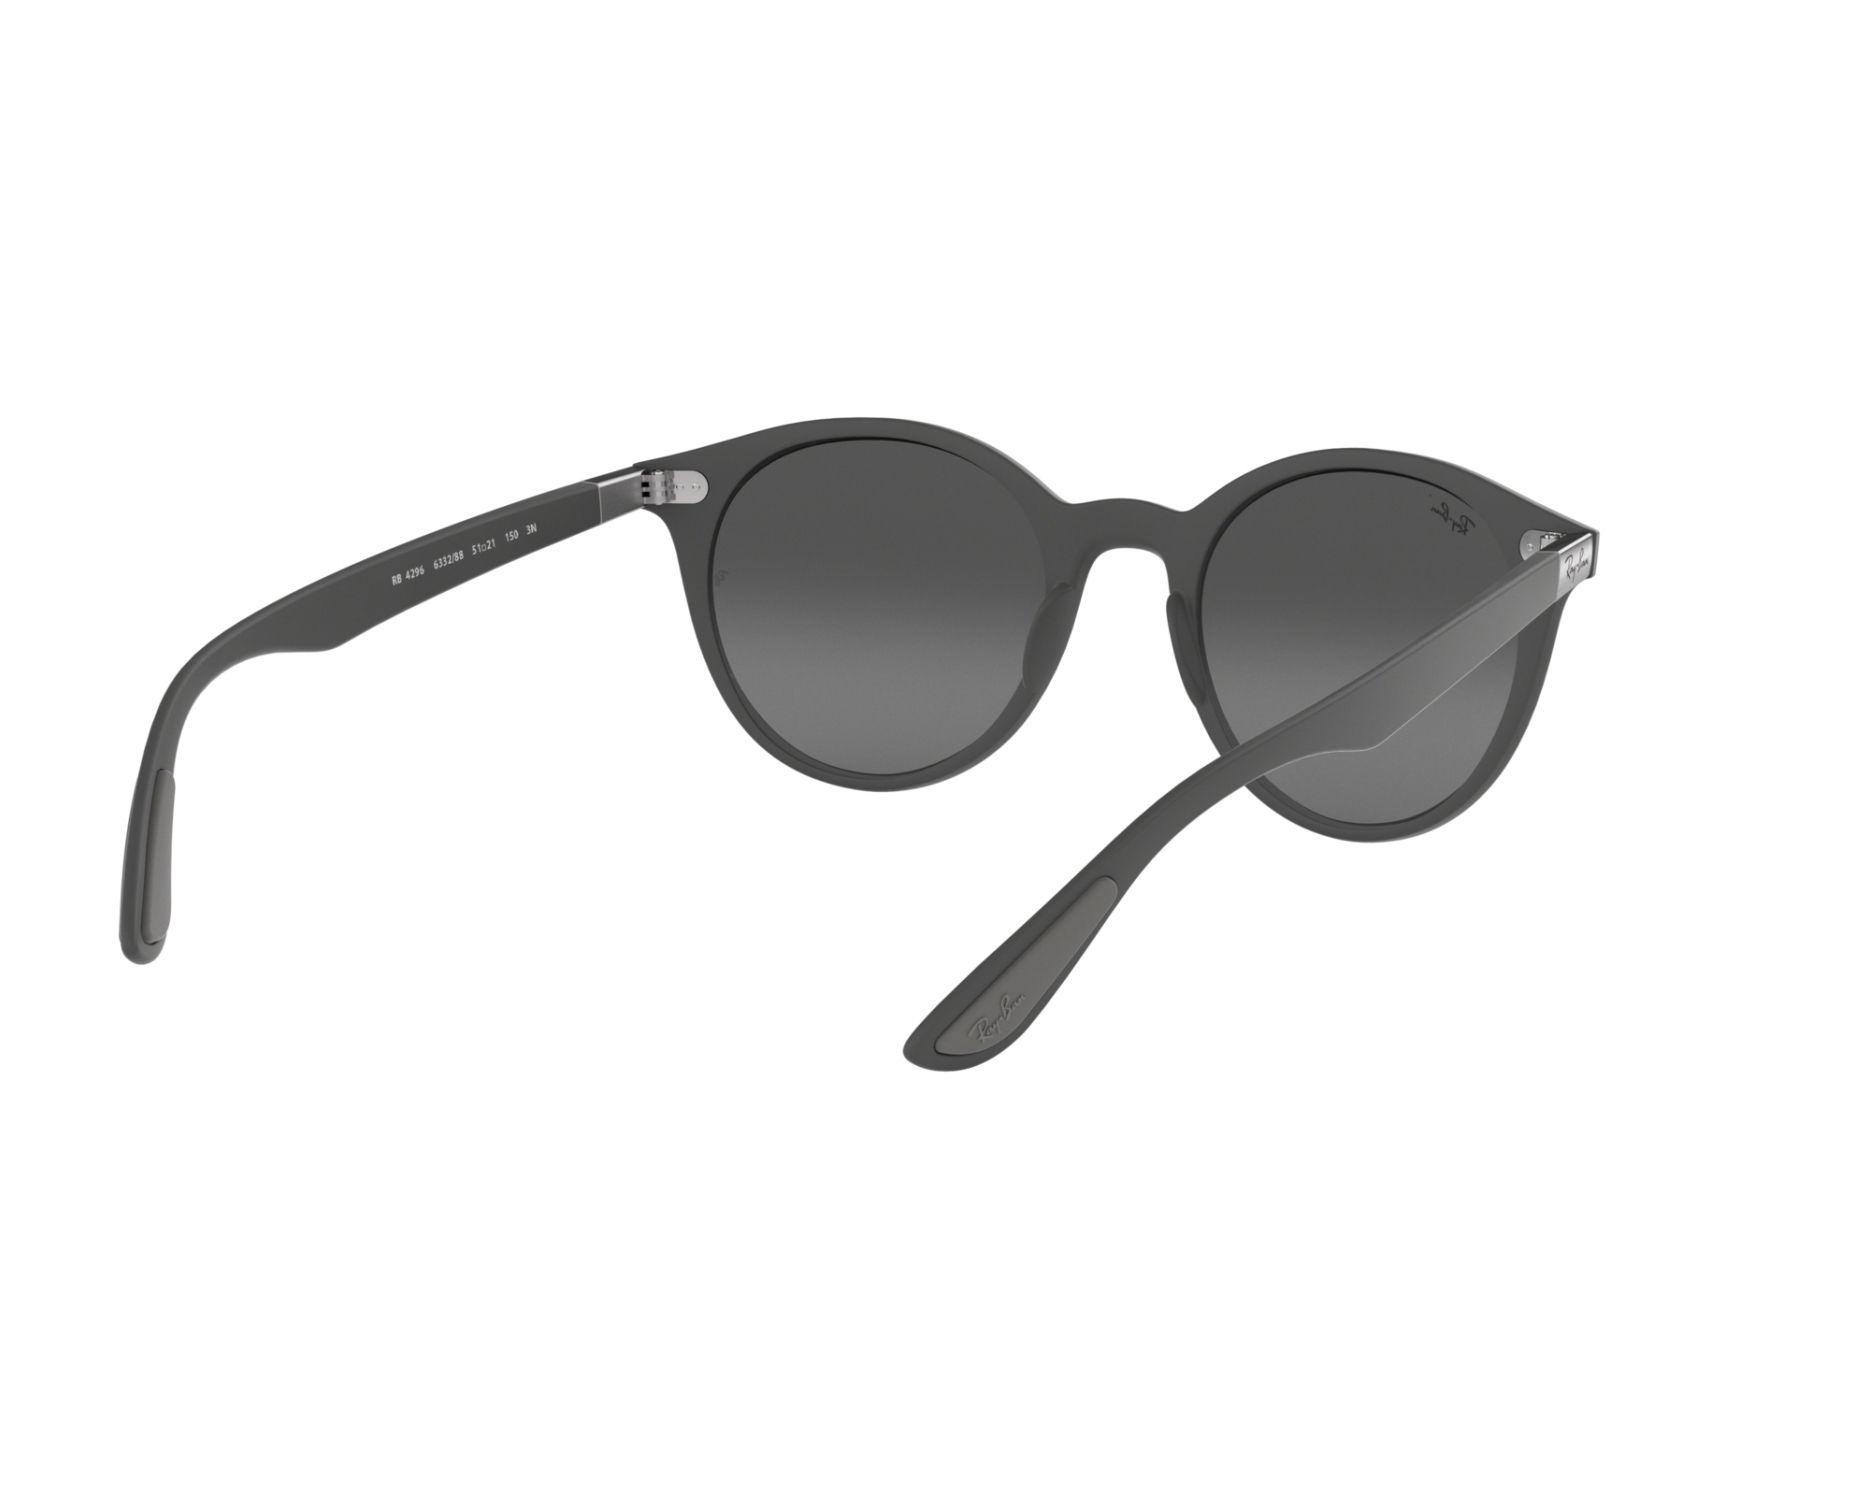 e7c1bb8a30 Sunglasses Ray-Ban RB-4296 633288 51-21 Grey 360 degree view 8